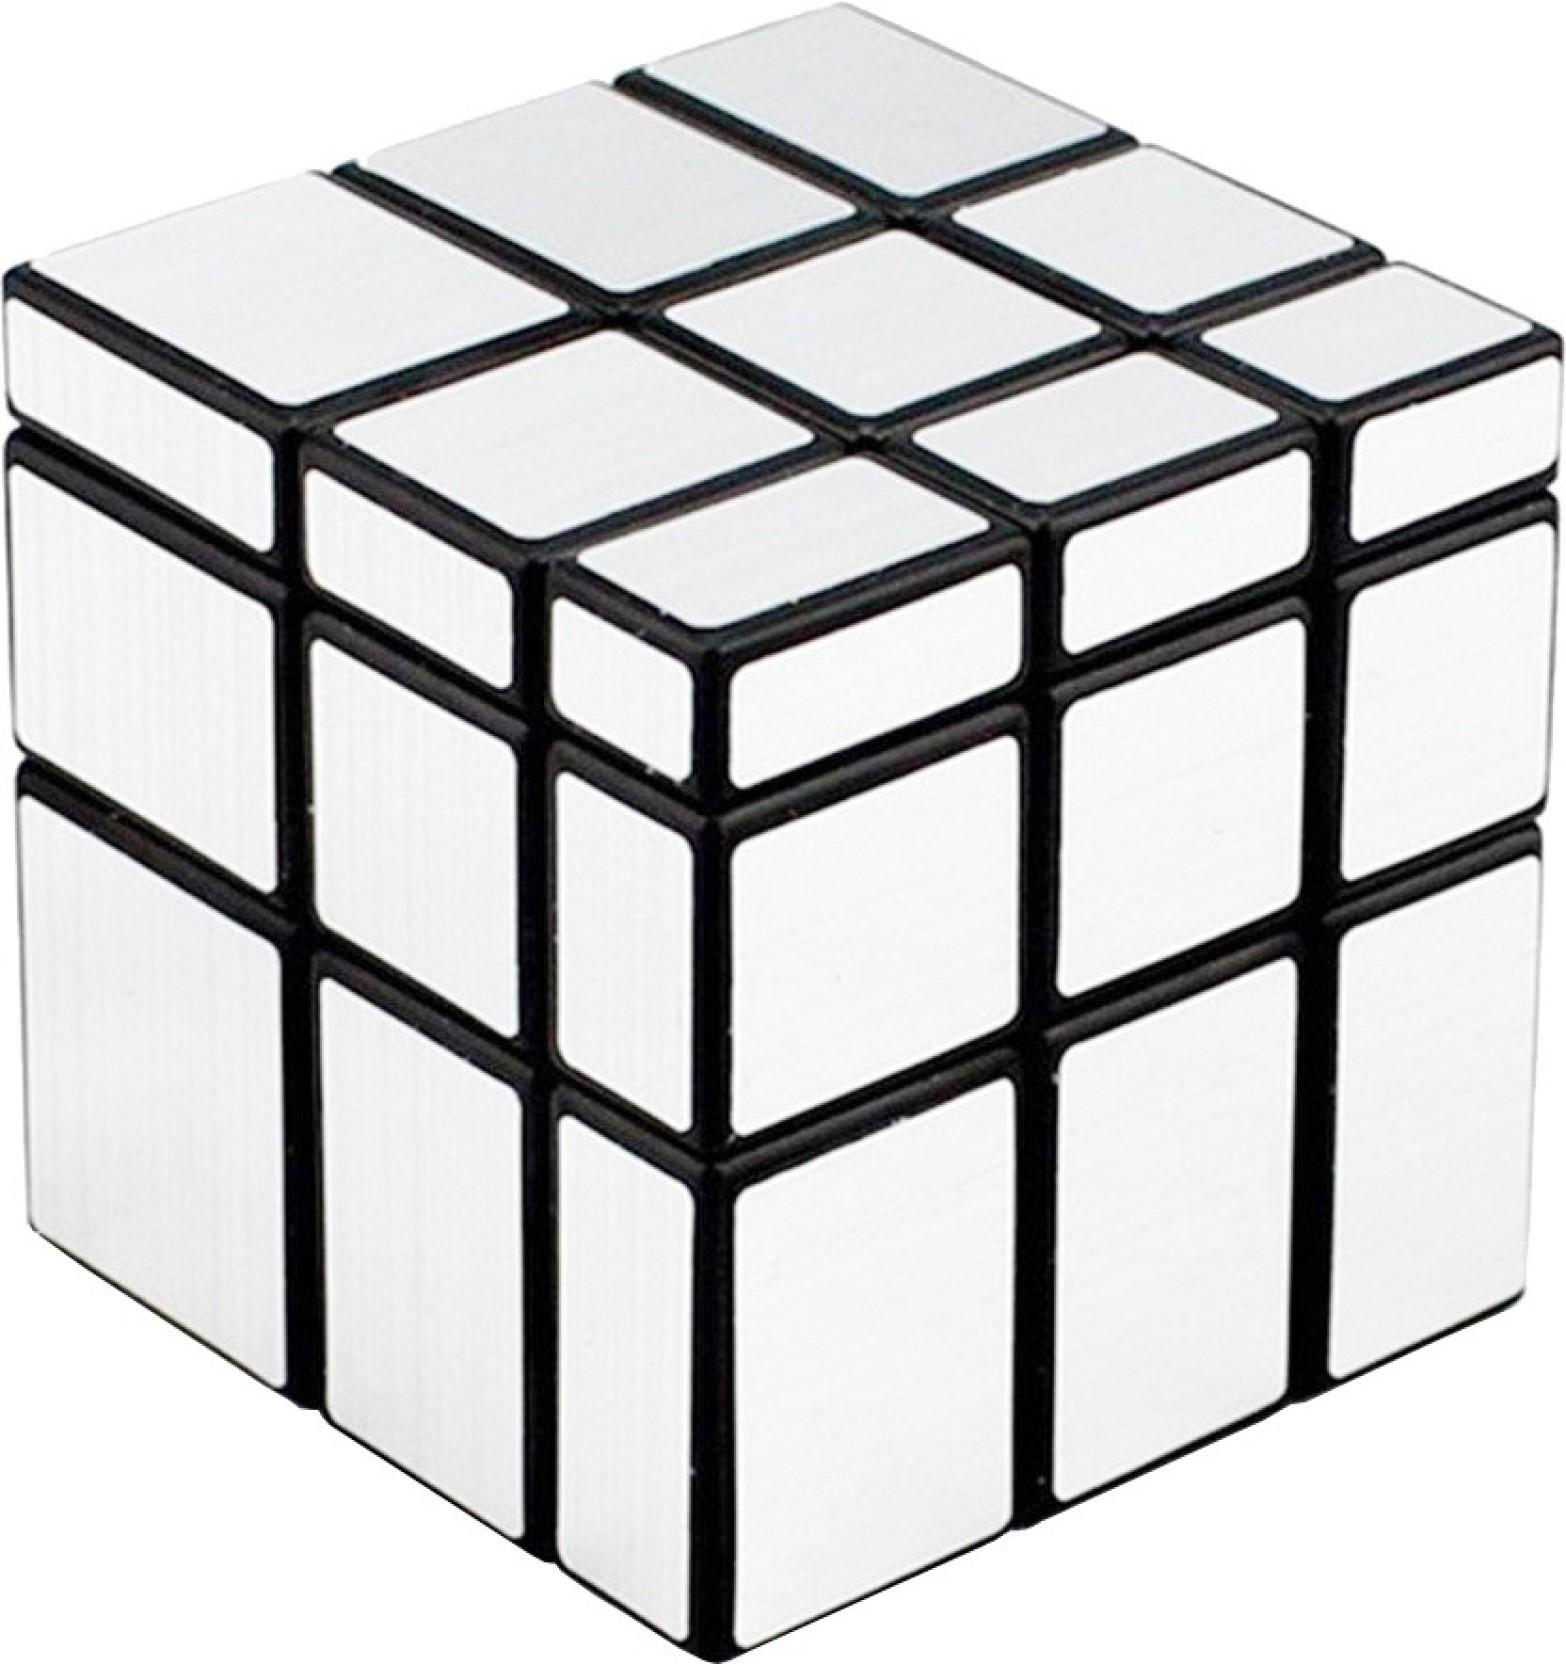 Rubiks Cube Drawing at GetDrawings | Free download